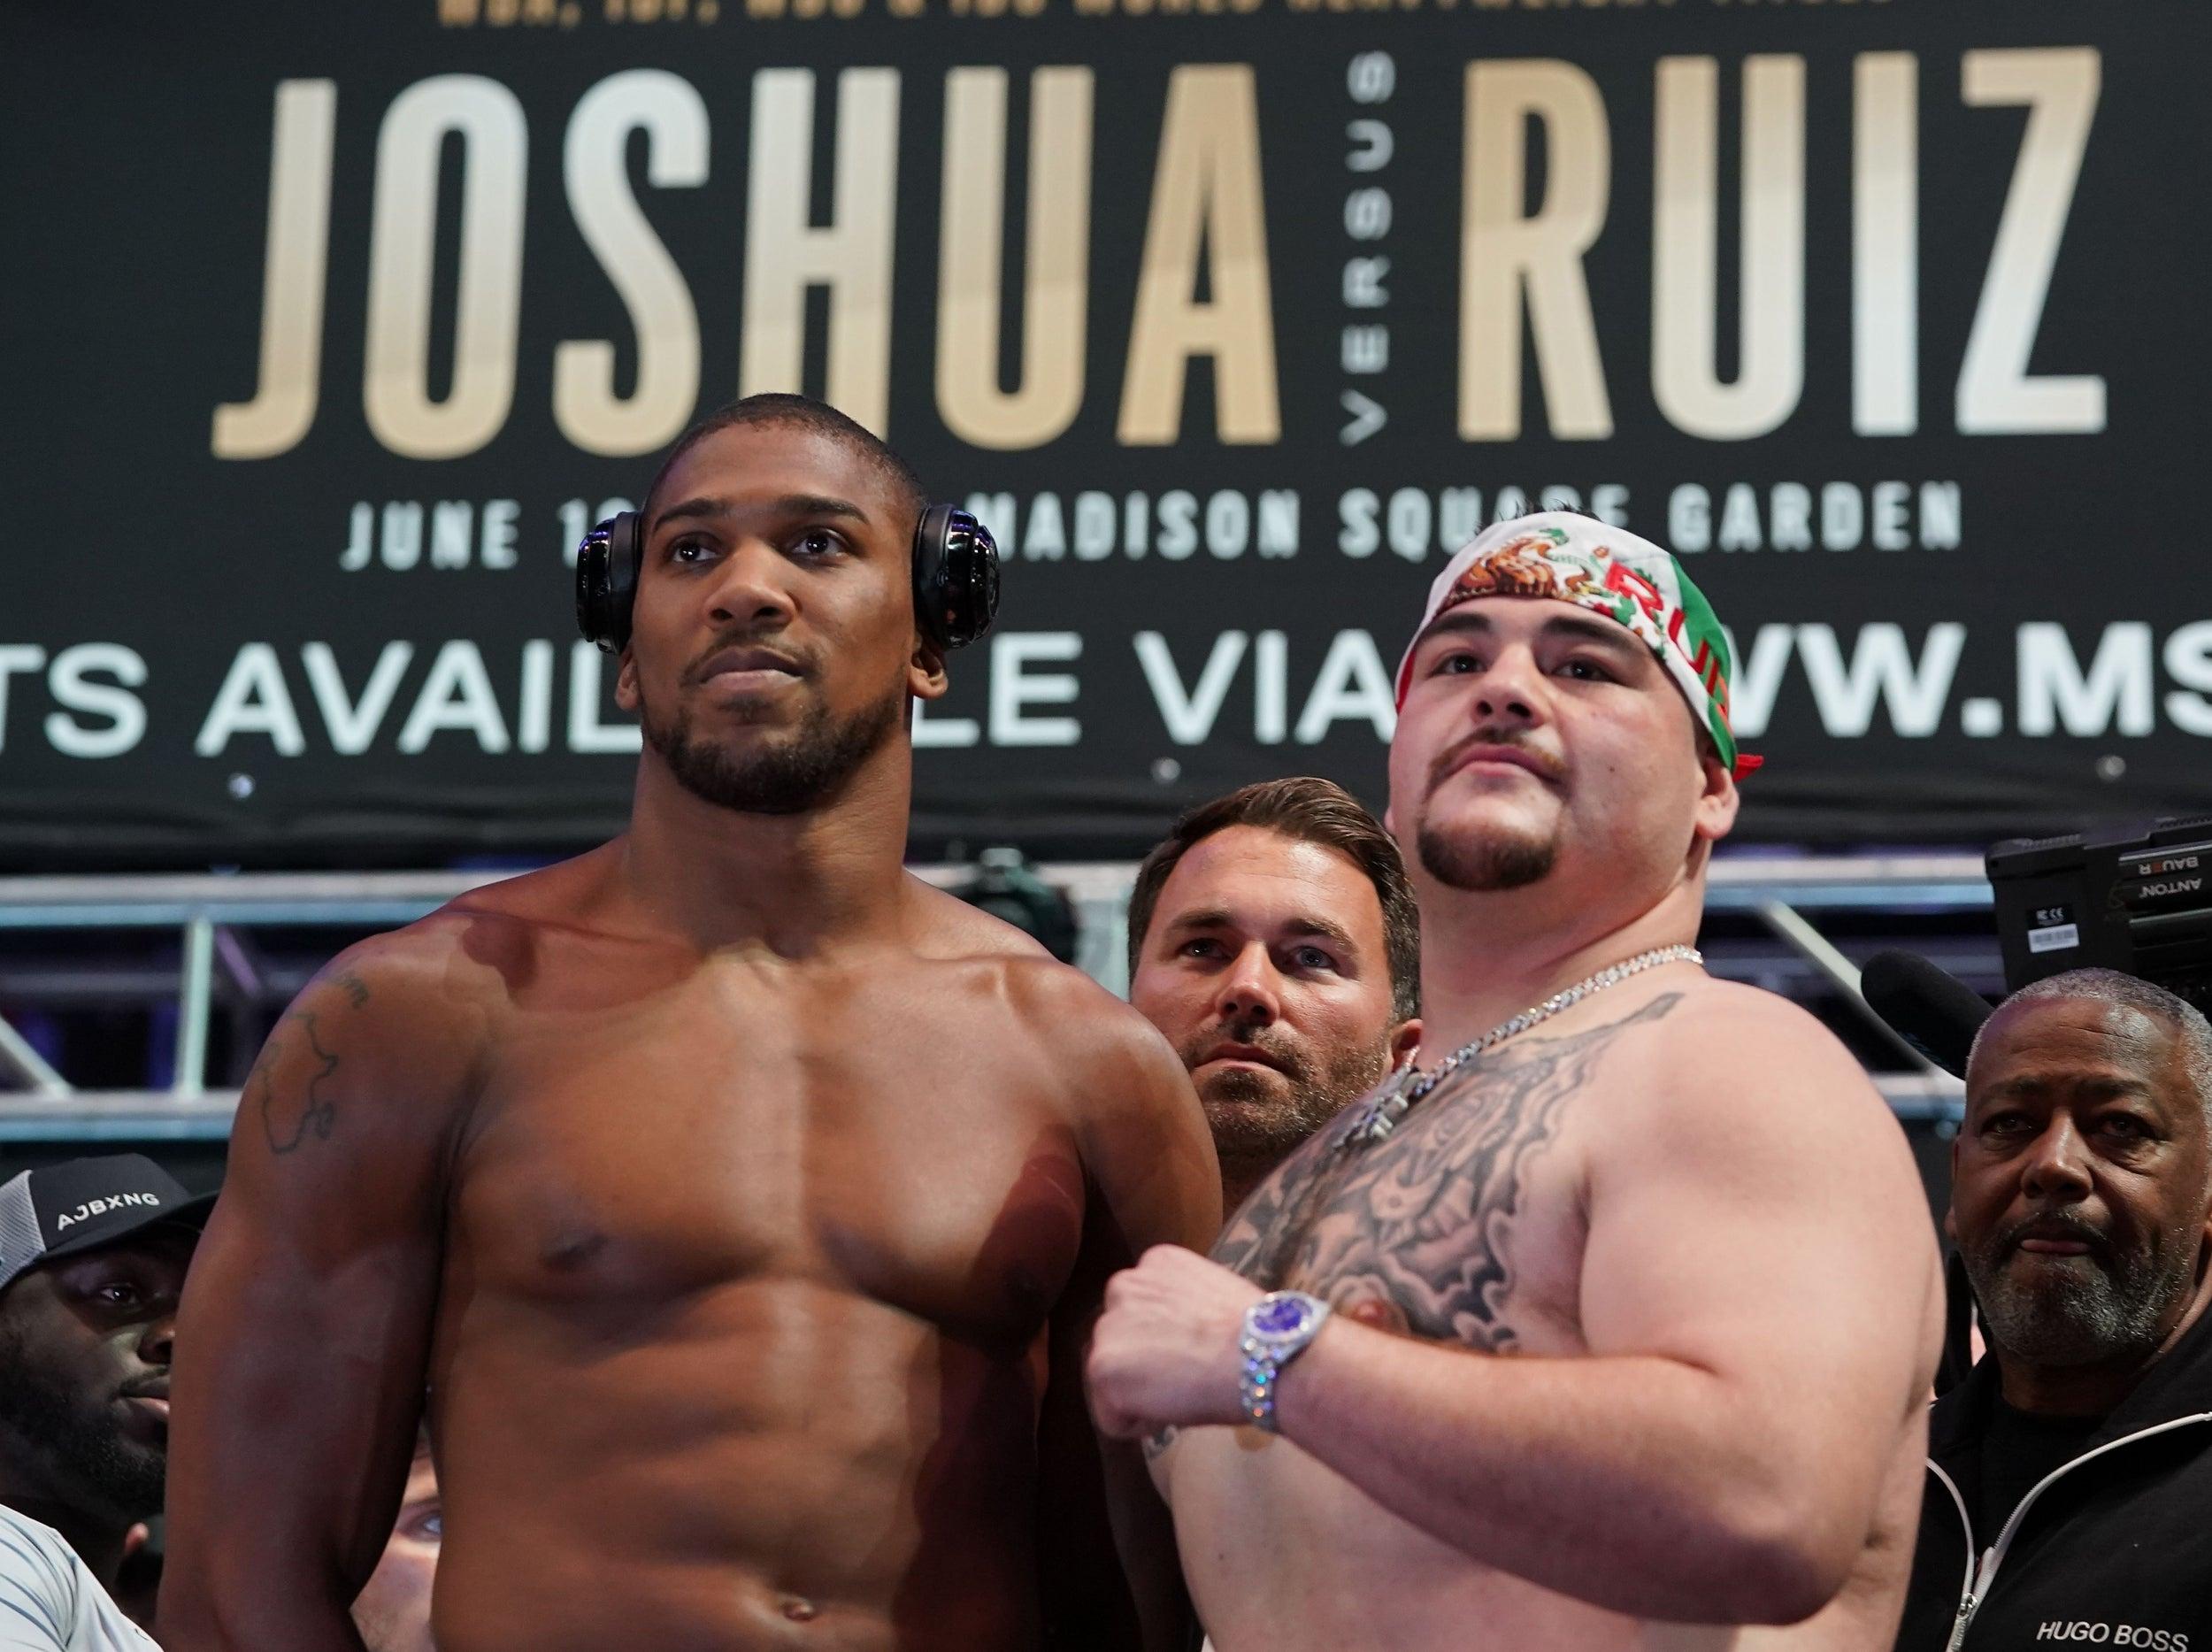 Joshua vs Ruiz LIVE: Fight time, stream, latest updates, what TV